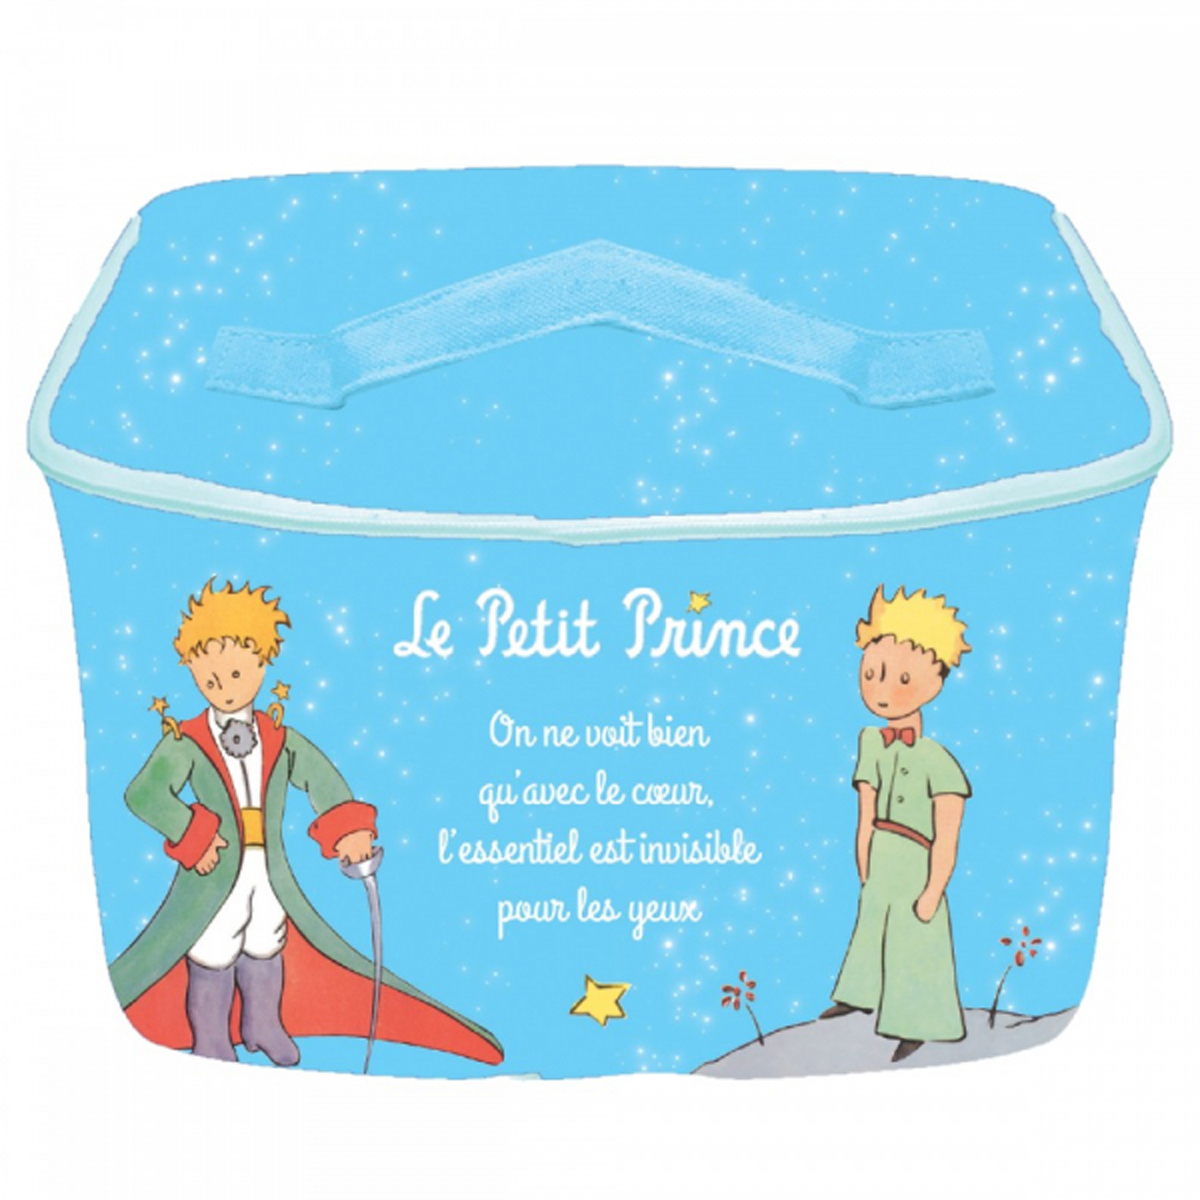 Sac repas isotherme \'Le Petit Prince\' turquoise - 23x155x13 cm - [R2014]